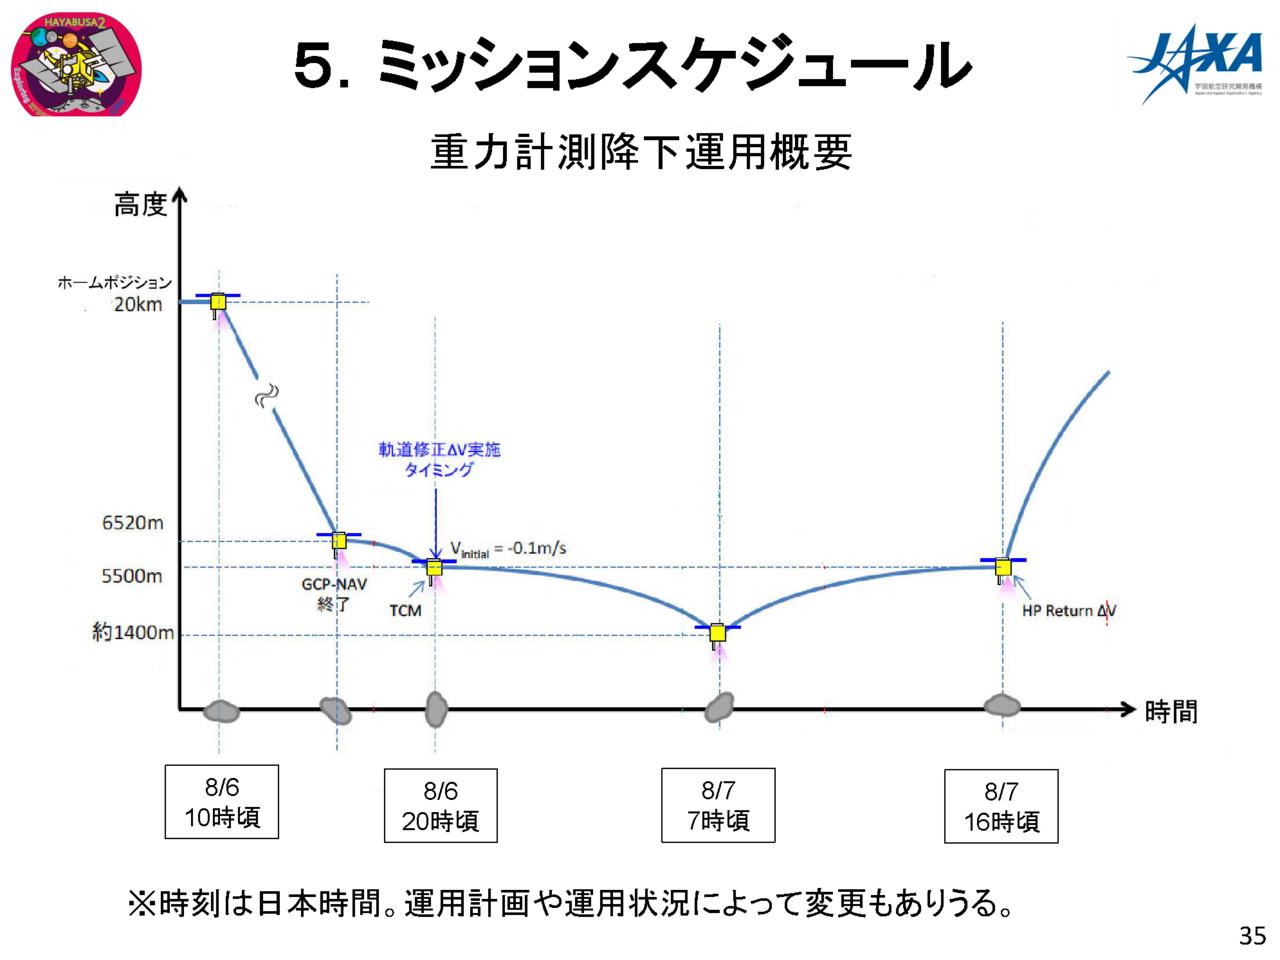 f:id:Imamura:20180719131730p:plain